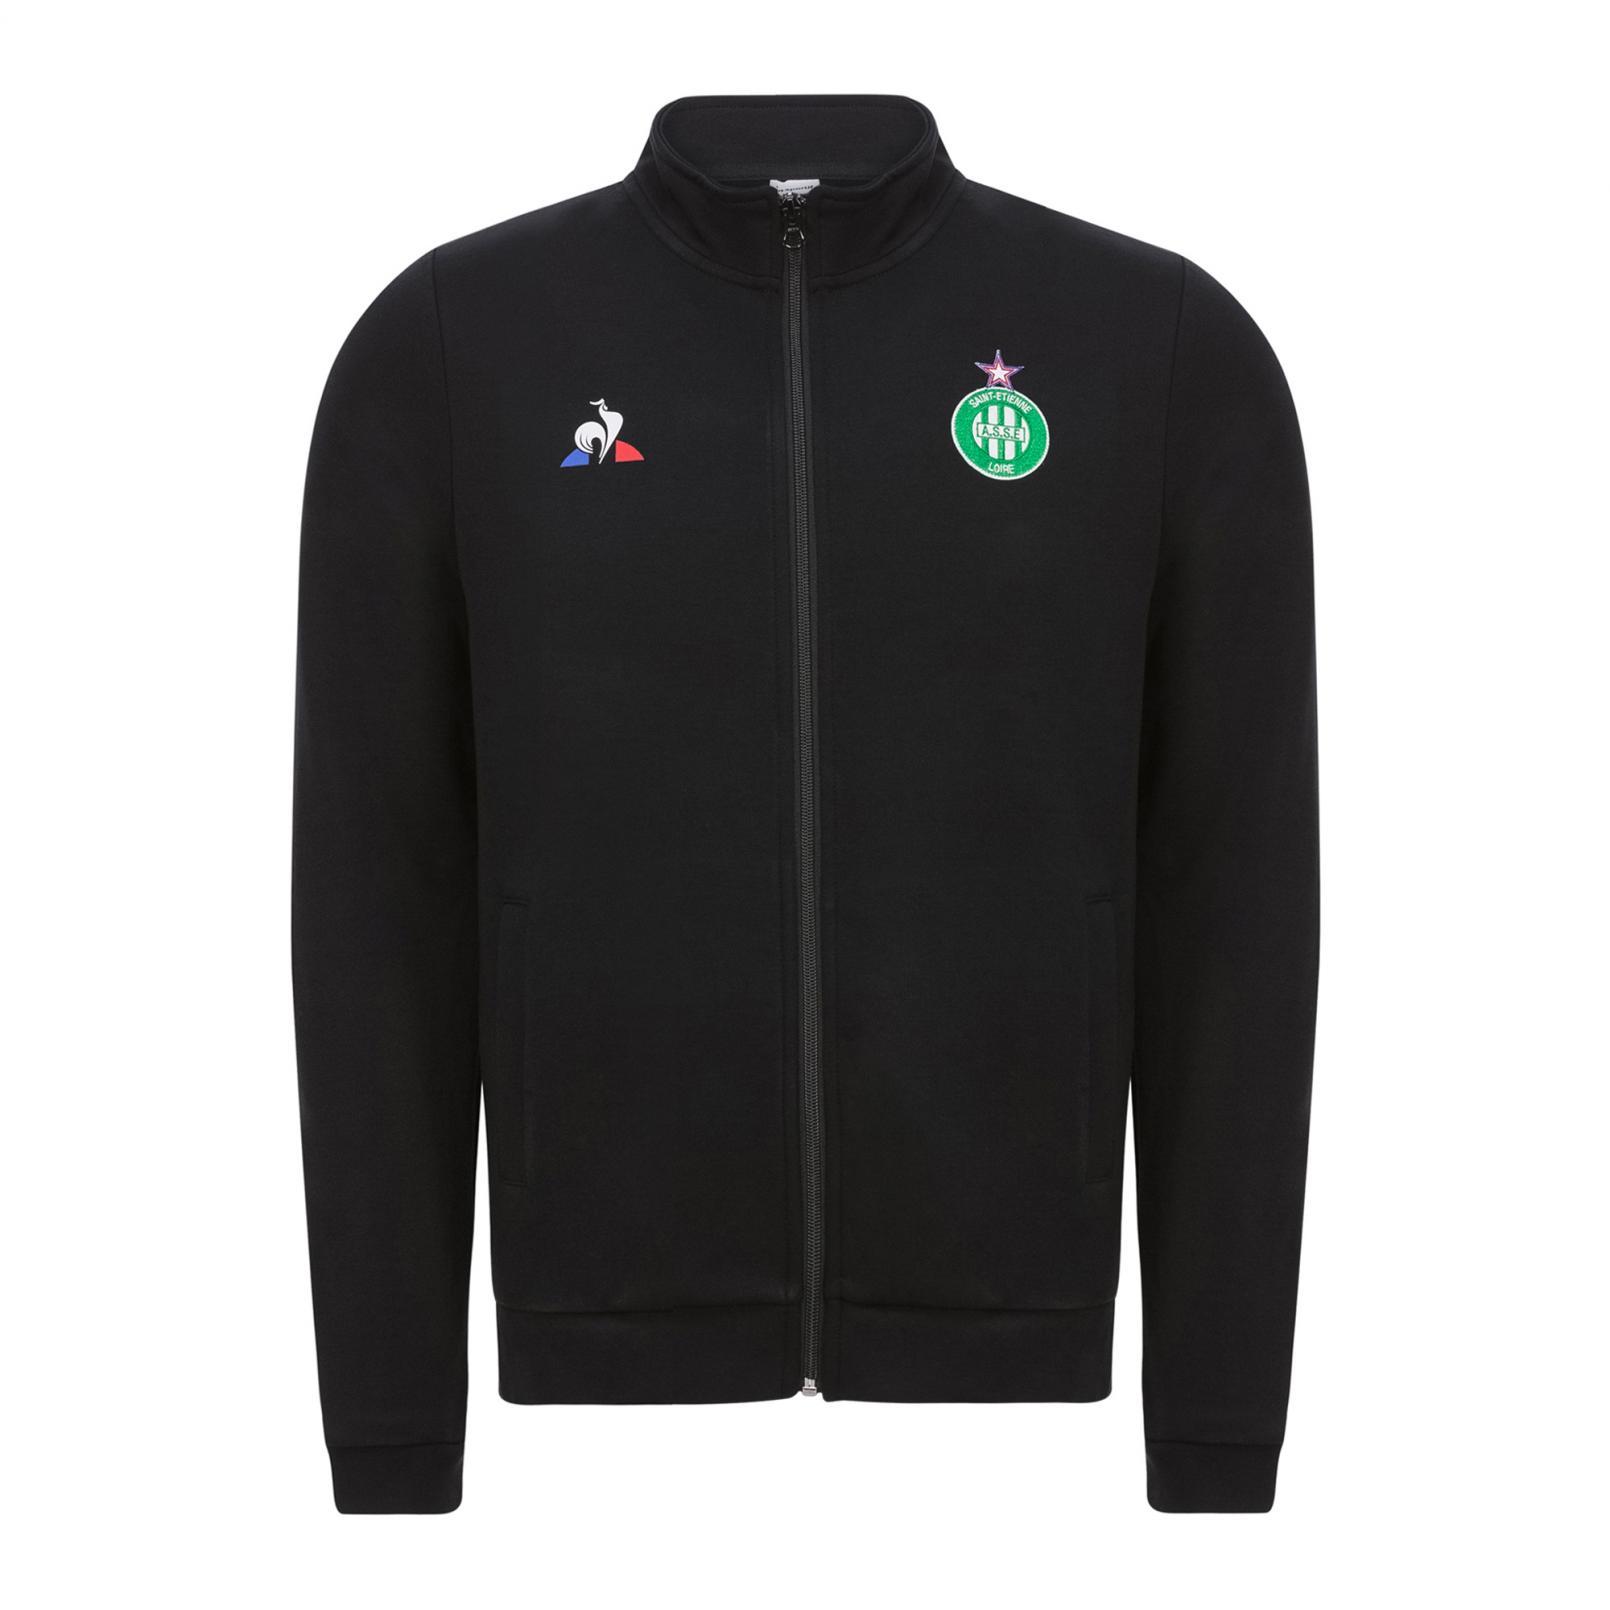 Sweat tops – Le Coq Sportif ASSE Pres Full zip sweatsthirt Black